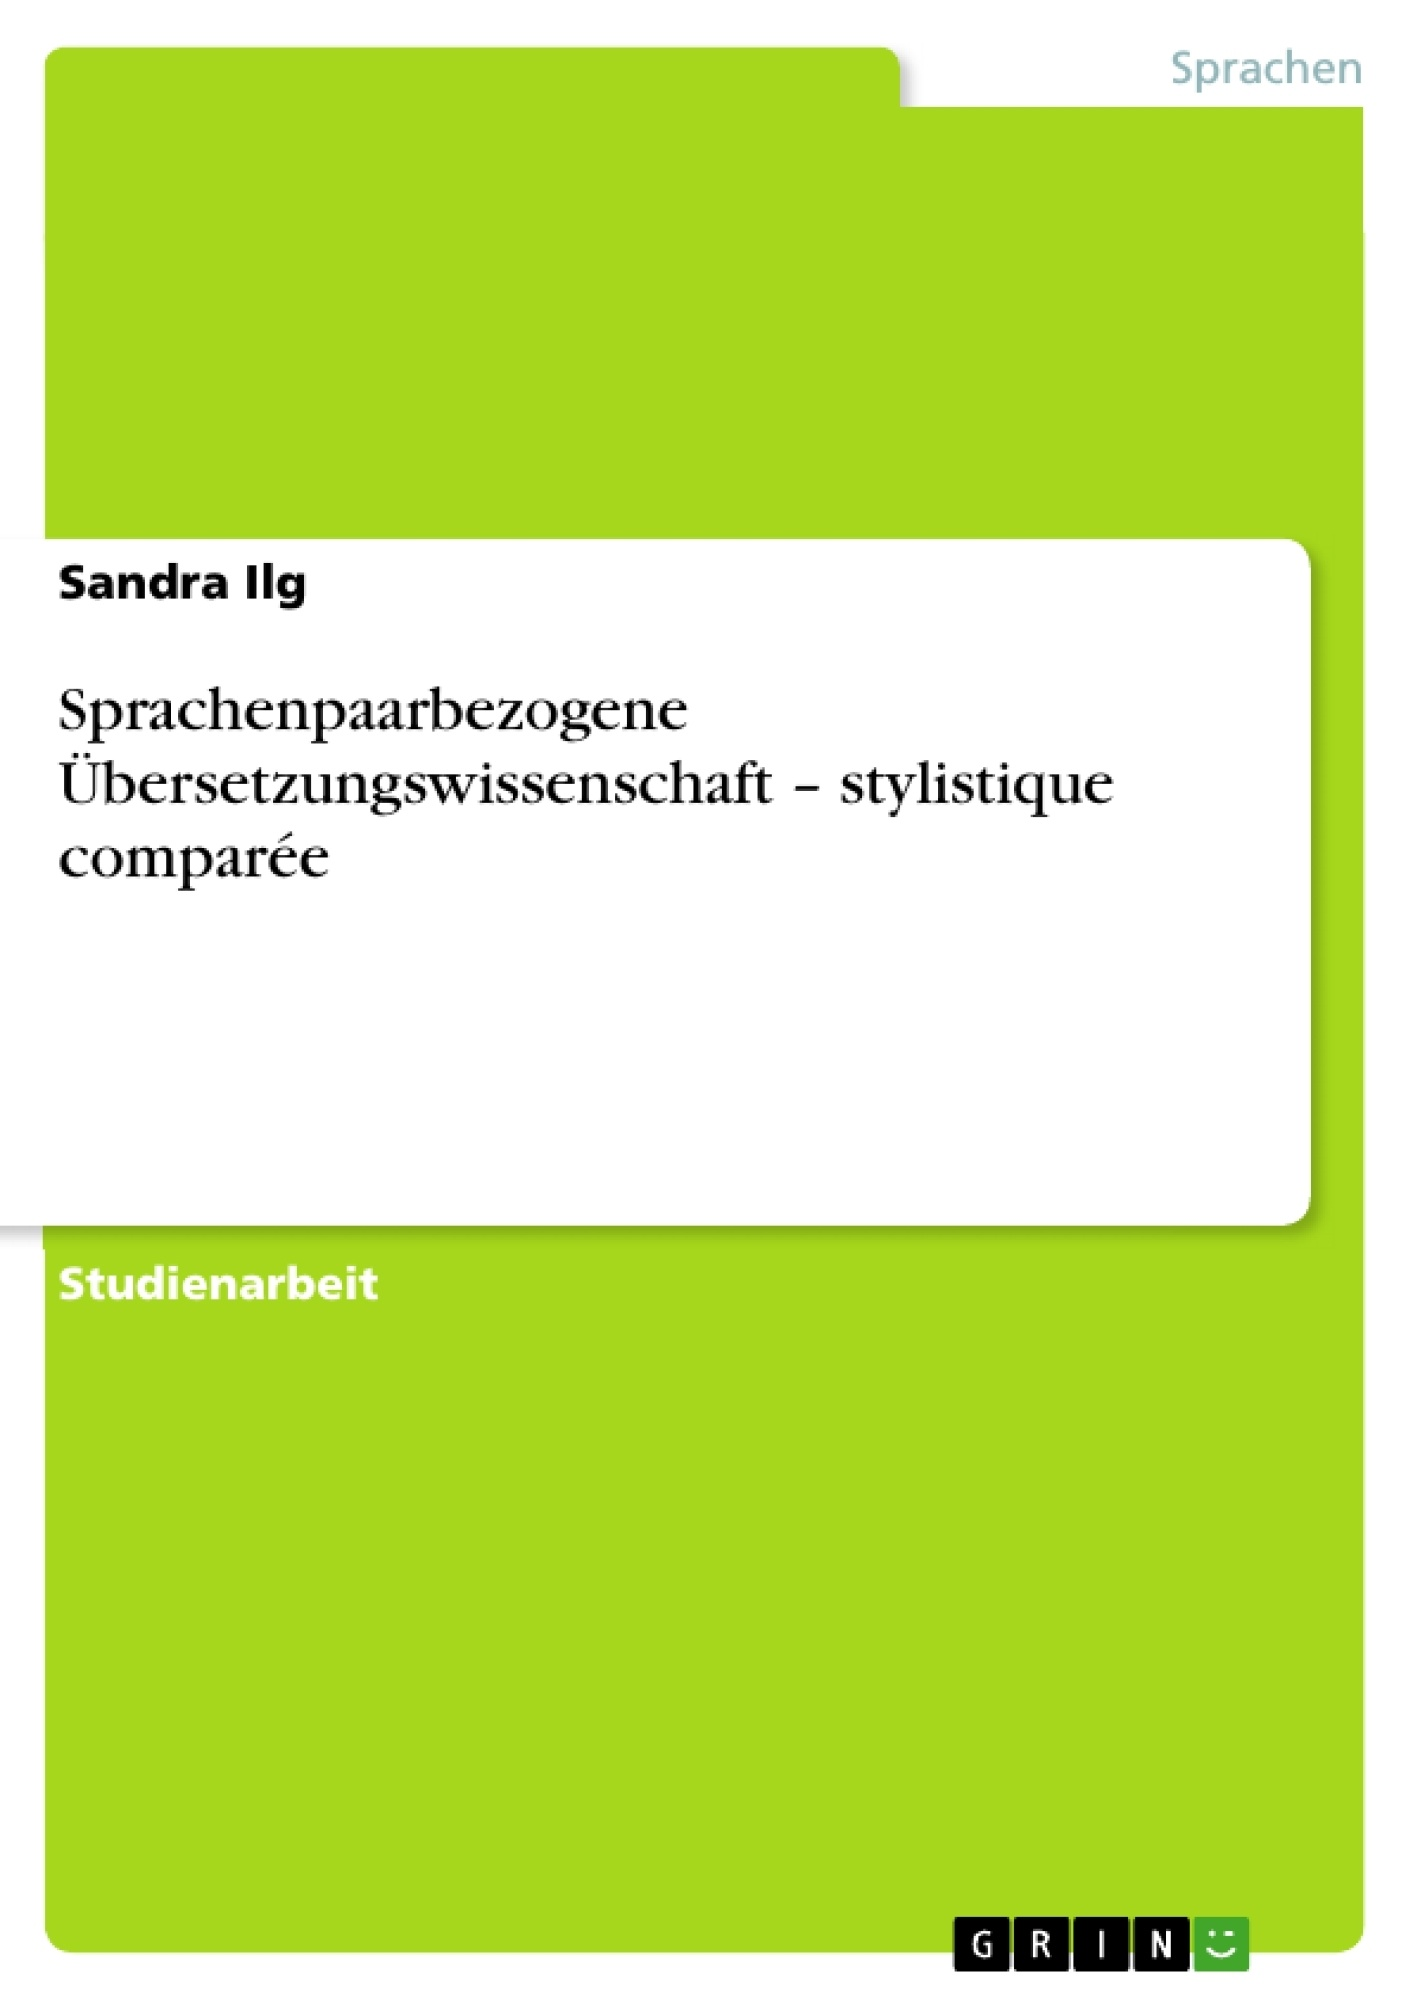 Titel: Sprachenpaarbezogene Übersetzungswissenschaft – stylistique comparée